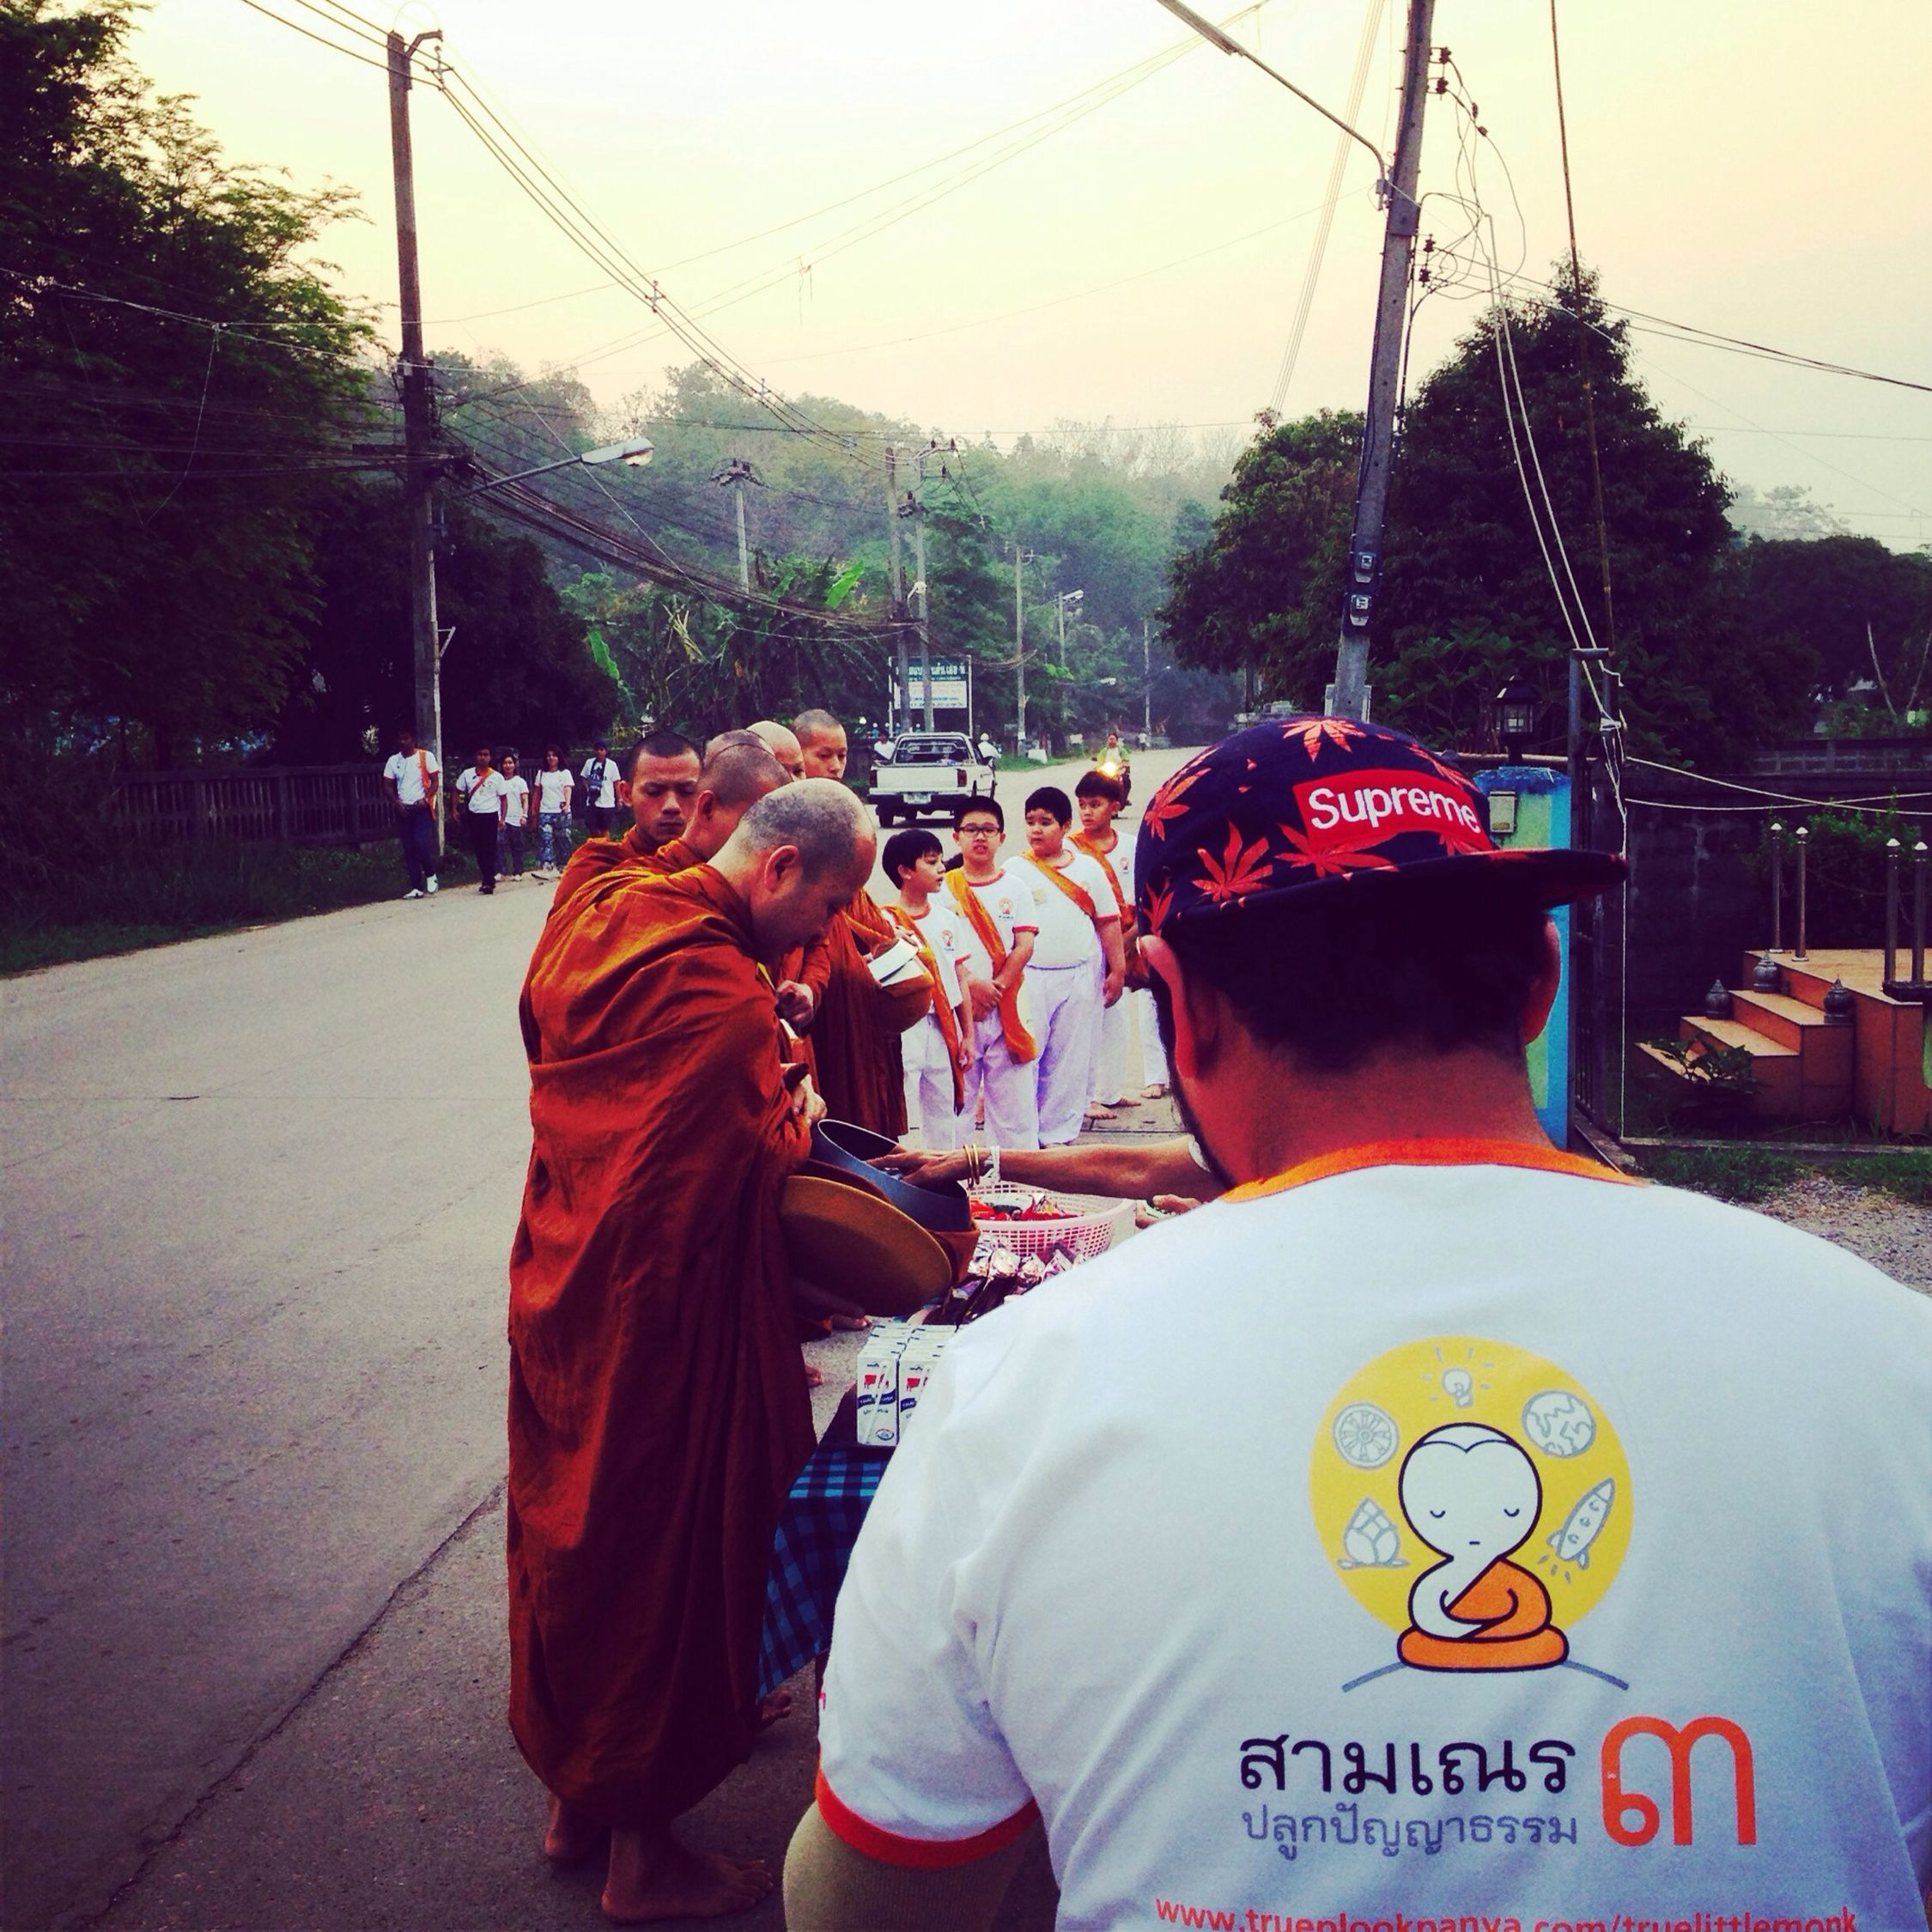 True Little Monk สามเณรปลูกปัญญาธรรม ปี ๓ Buddhism นอน2ช.ม. ตื่นมาวิ่ง! ??